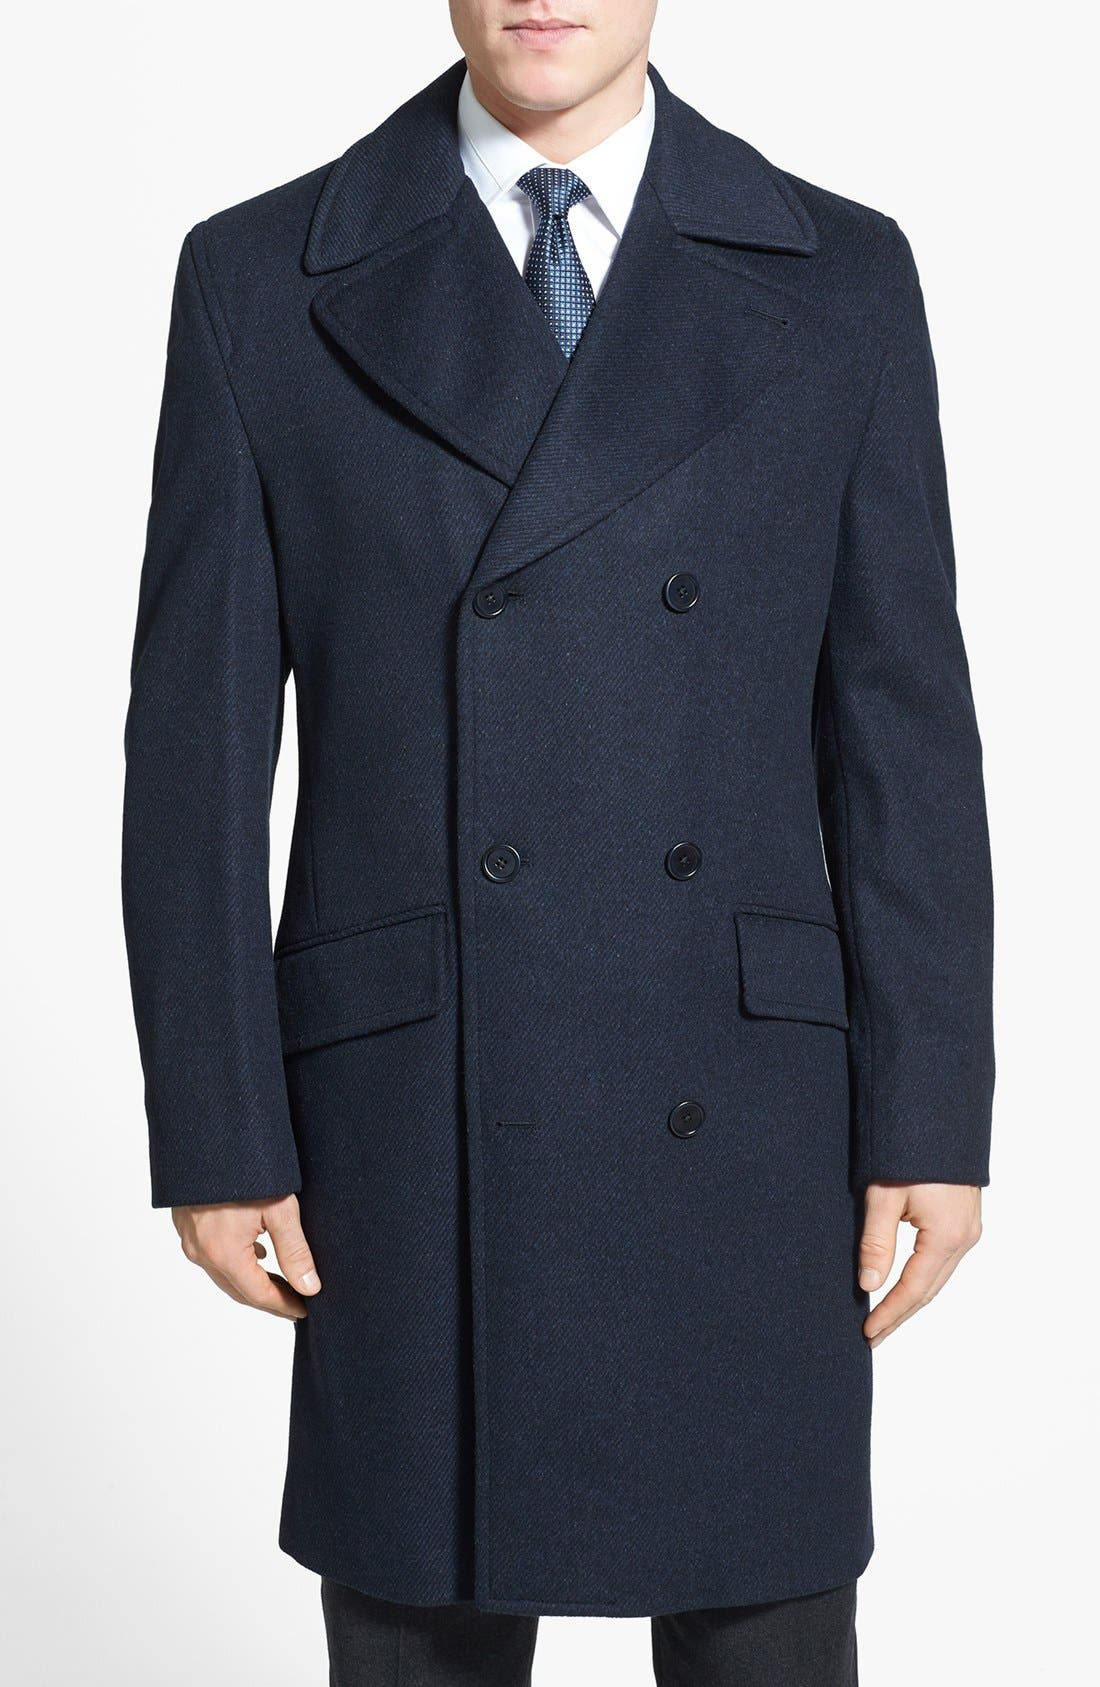 Main Image - Cardinal of Canada Wool Blend Top Coat